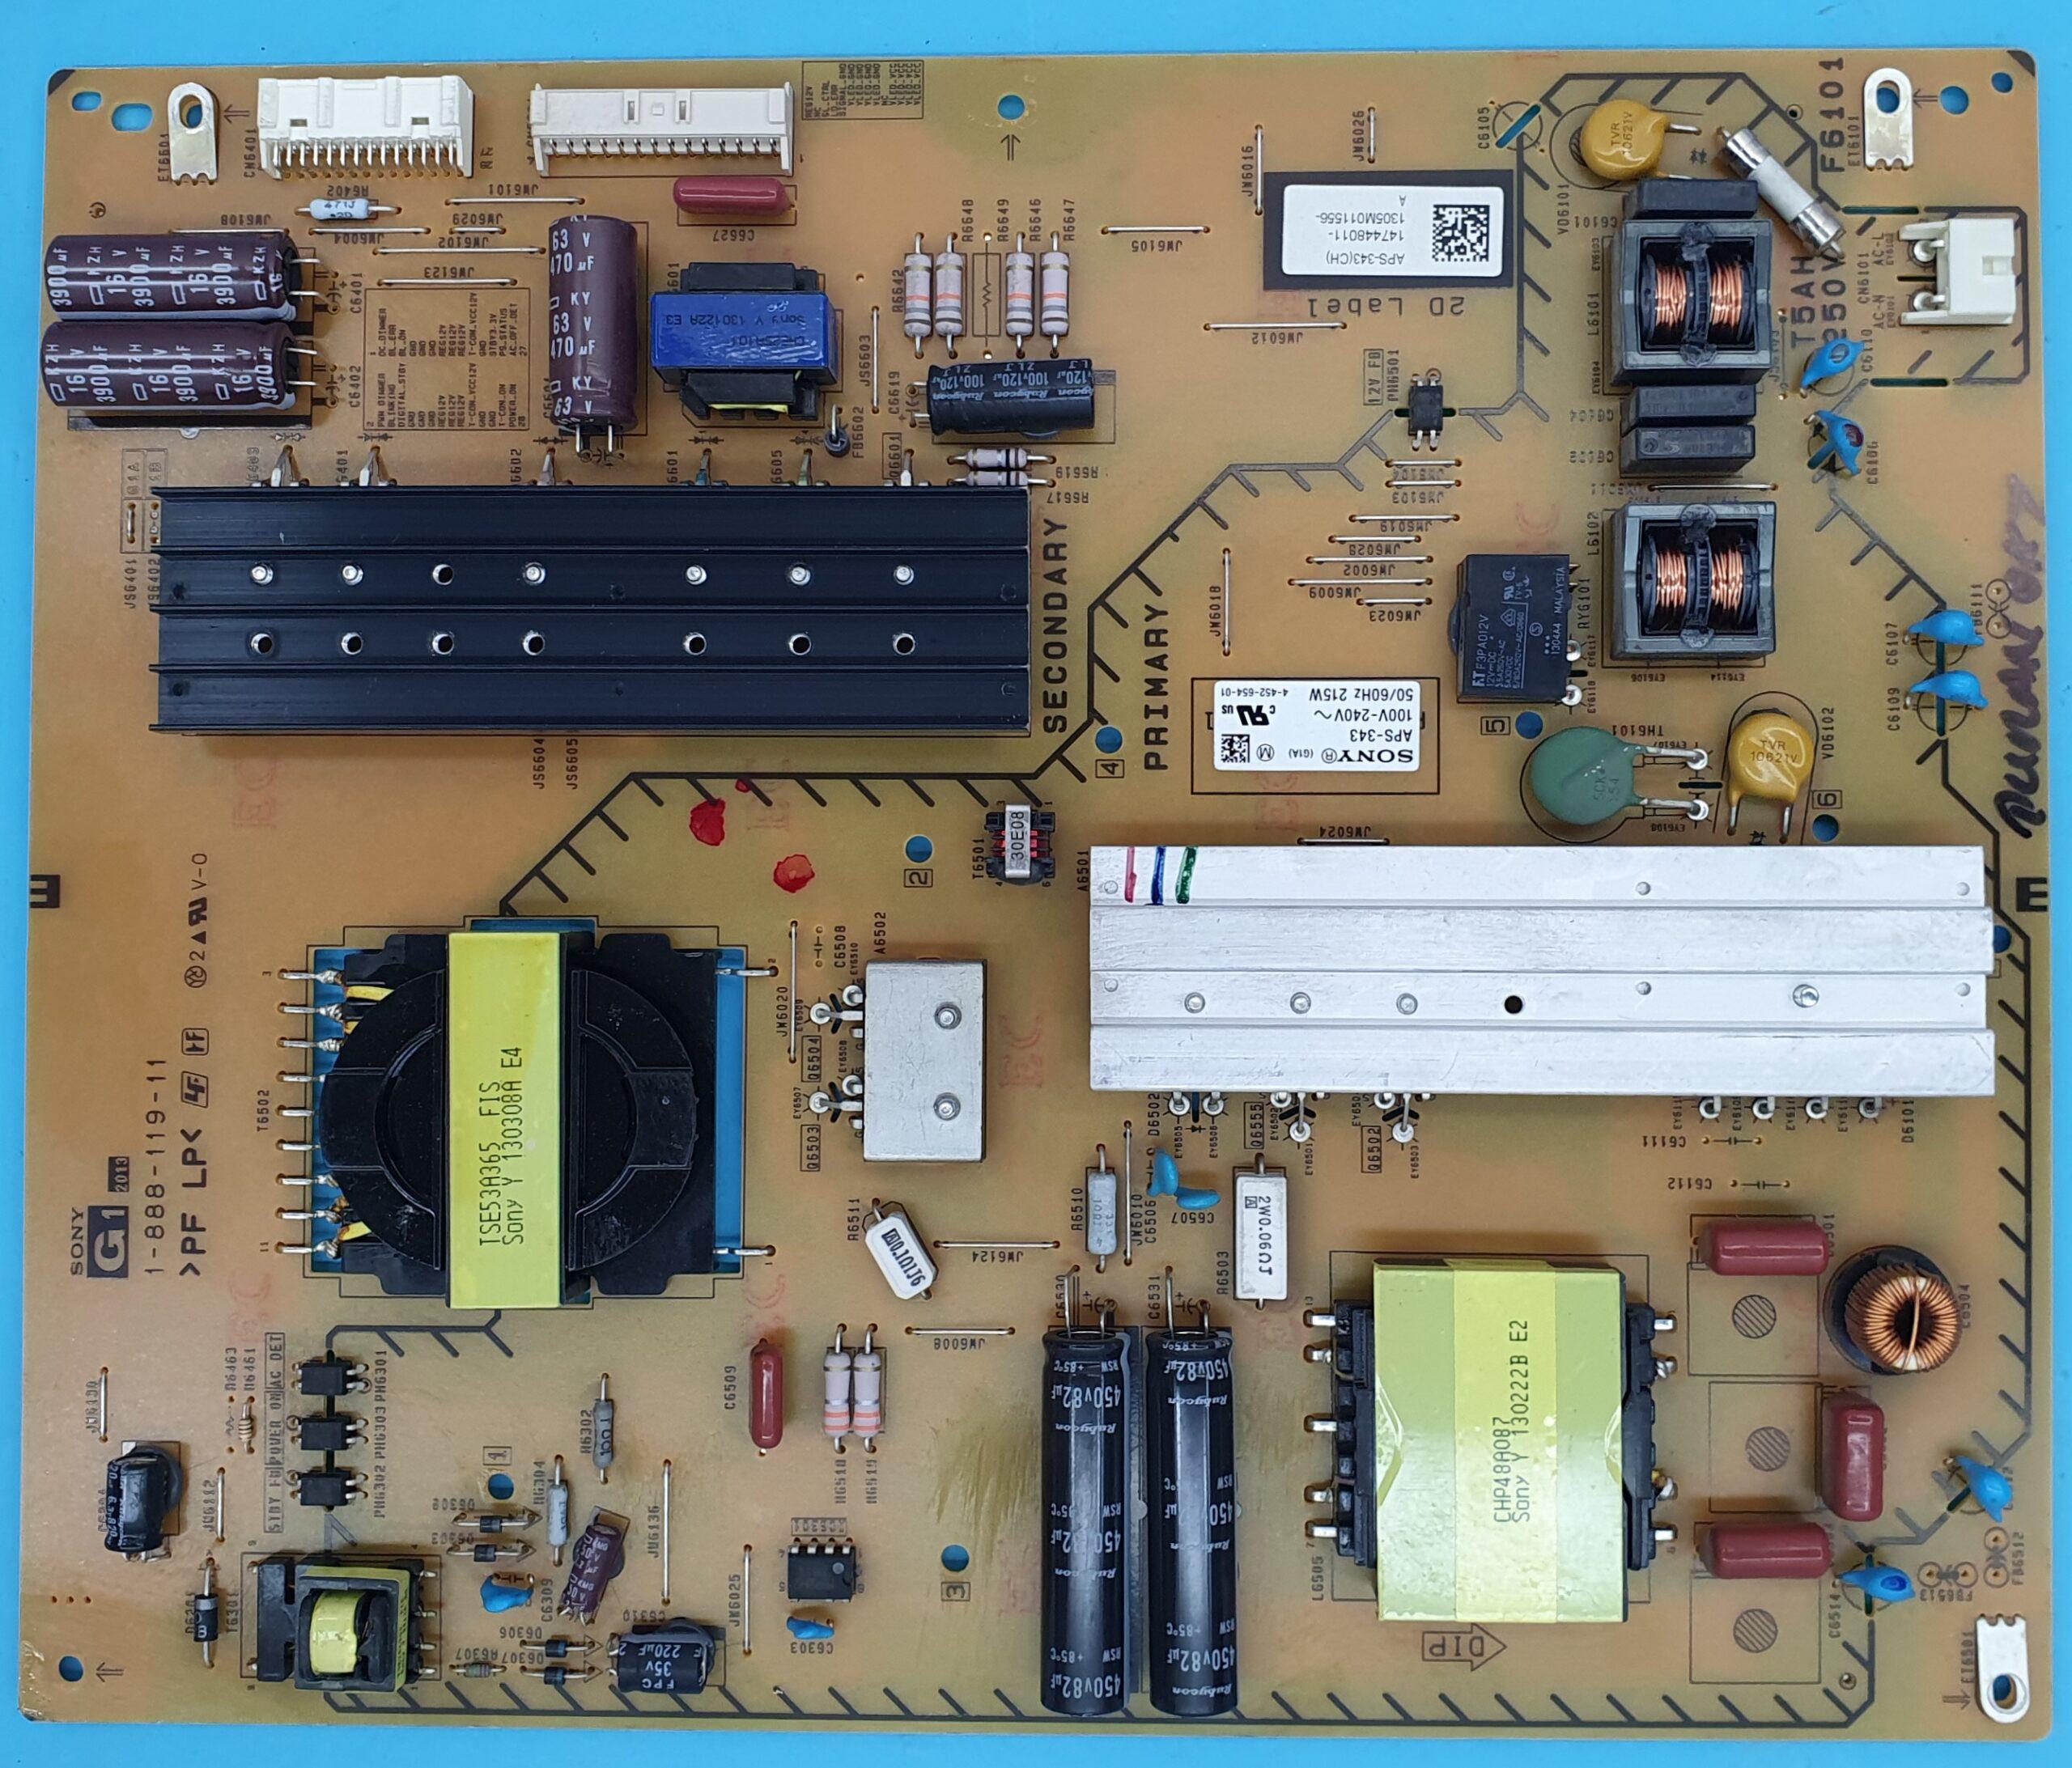 1-888-119-11 Sony Power ( KDV DAHİL = 200 TL)